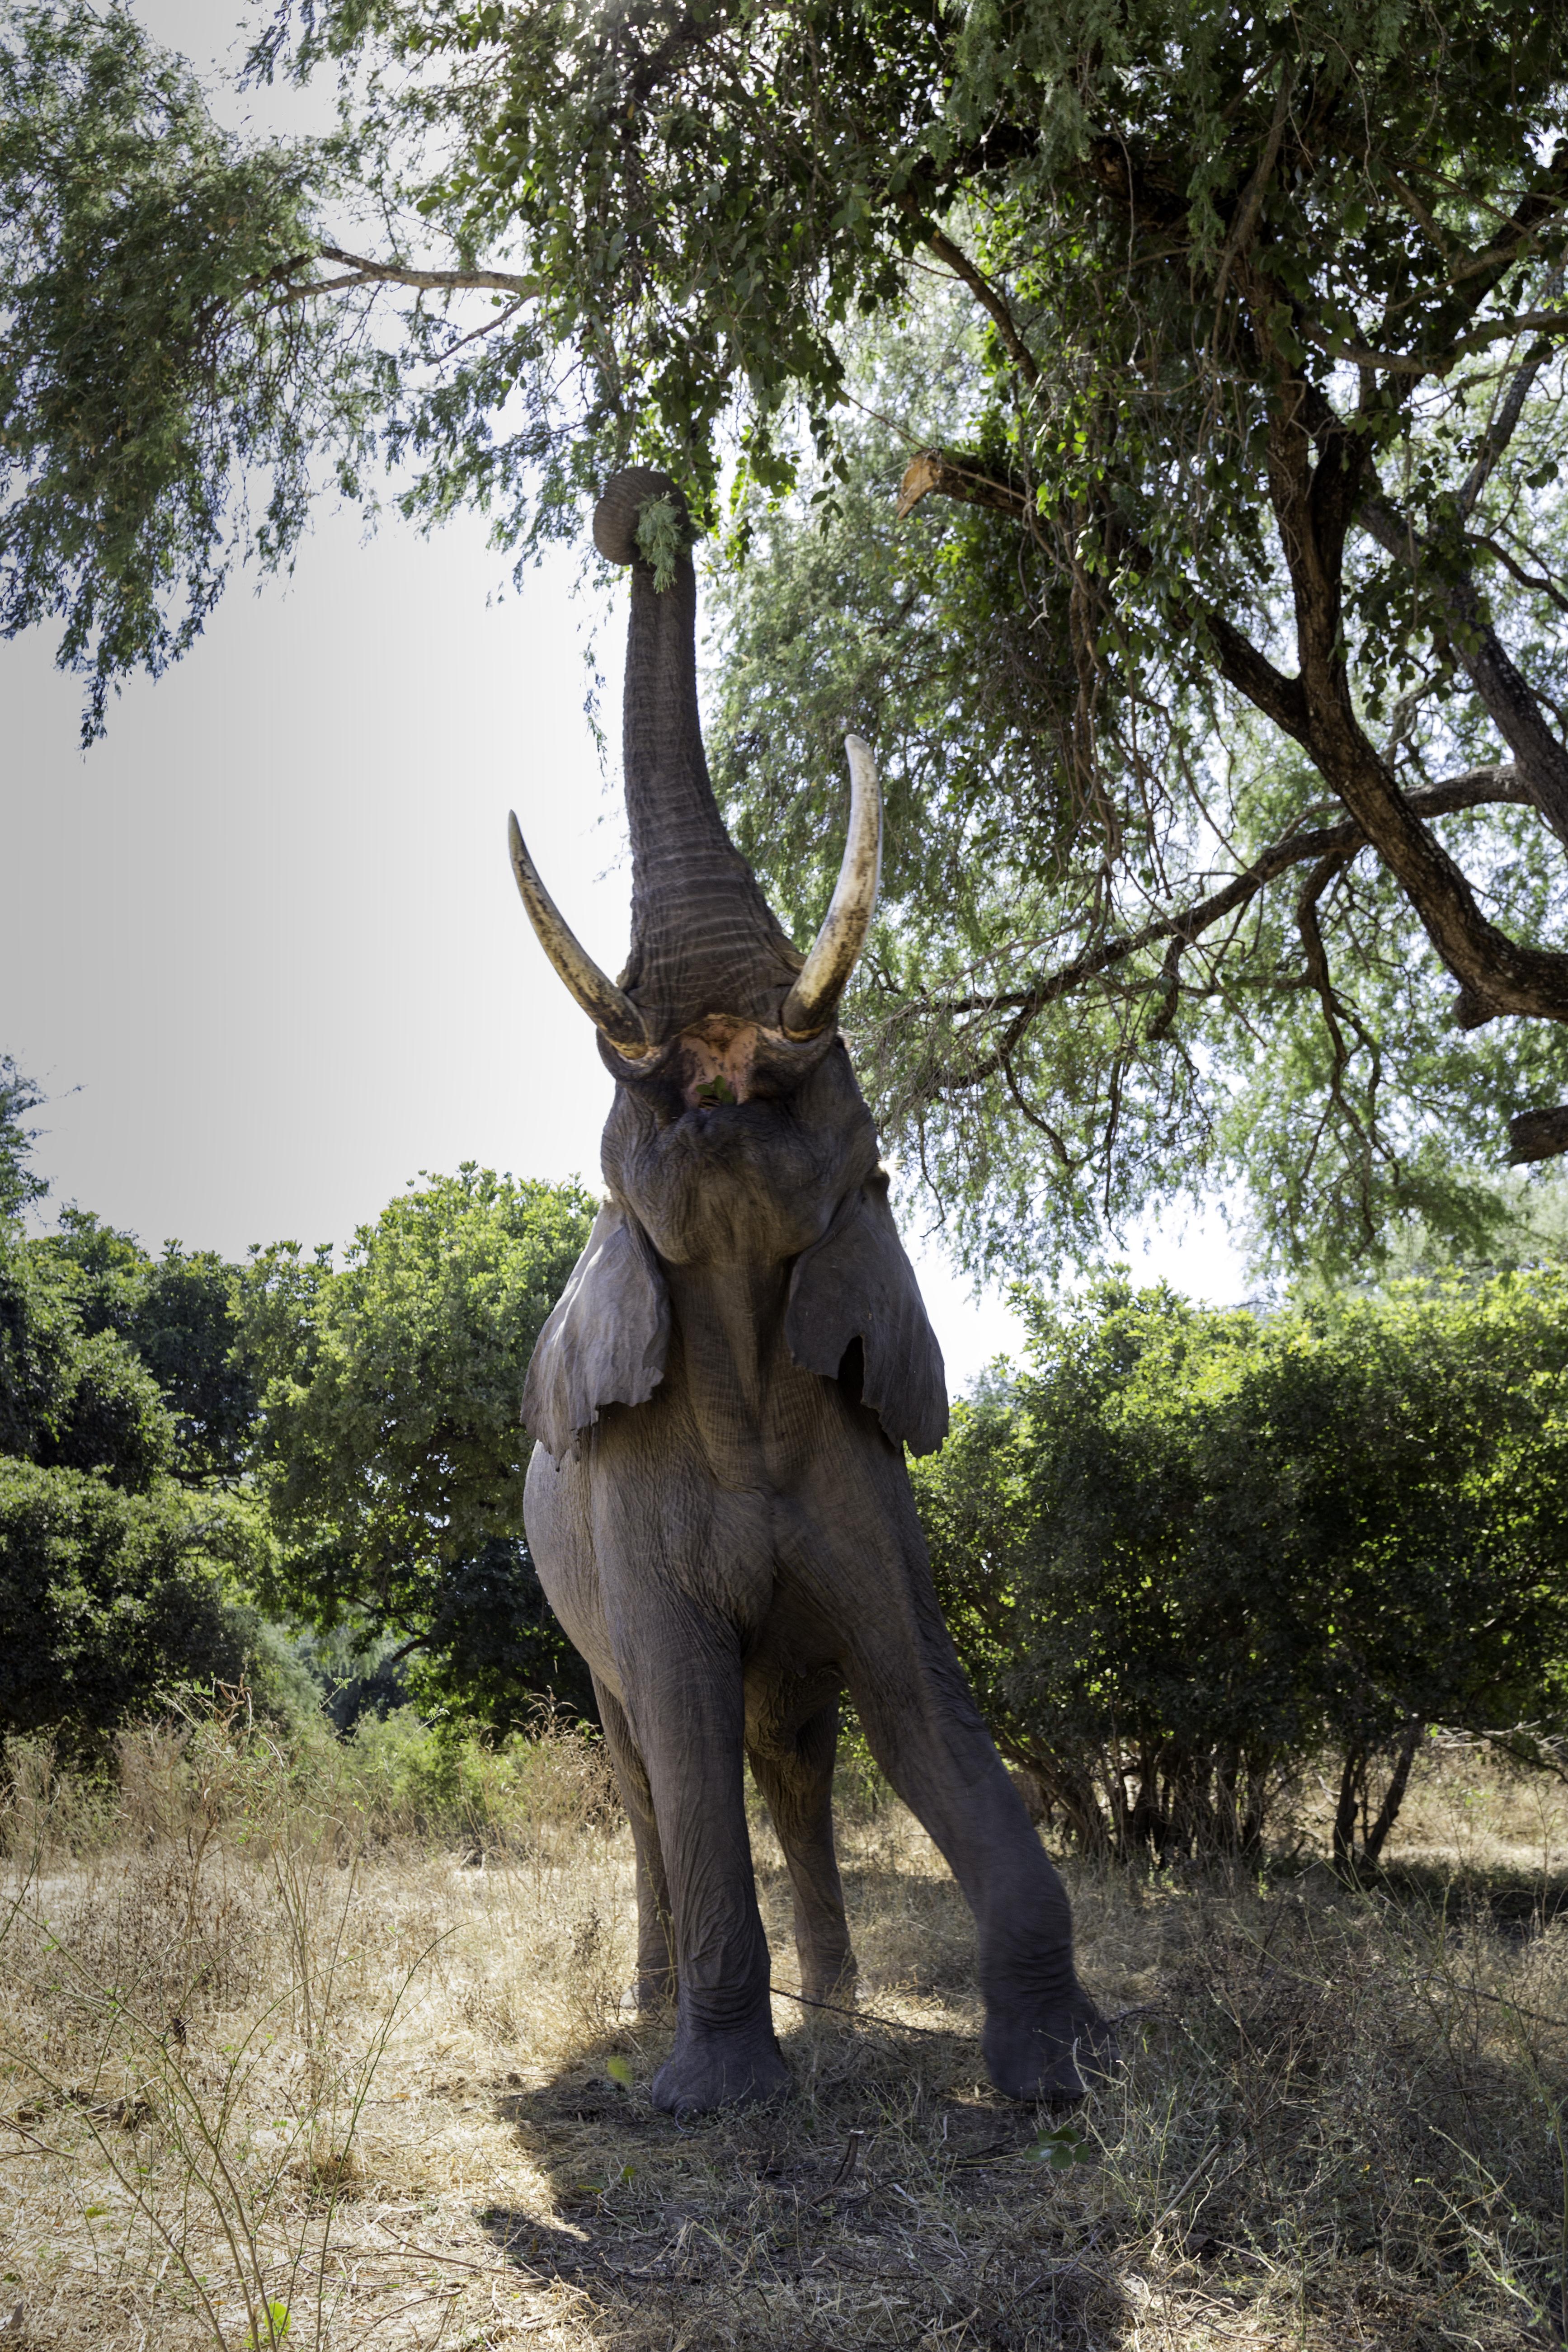 ManaPools Elephant